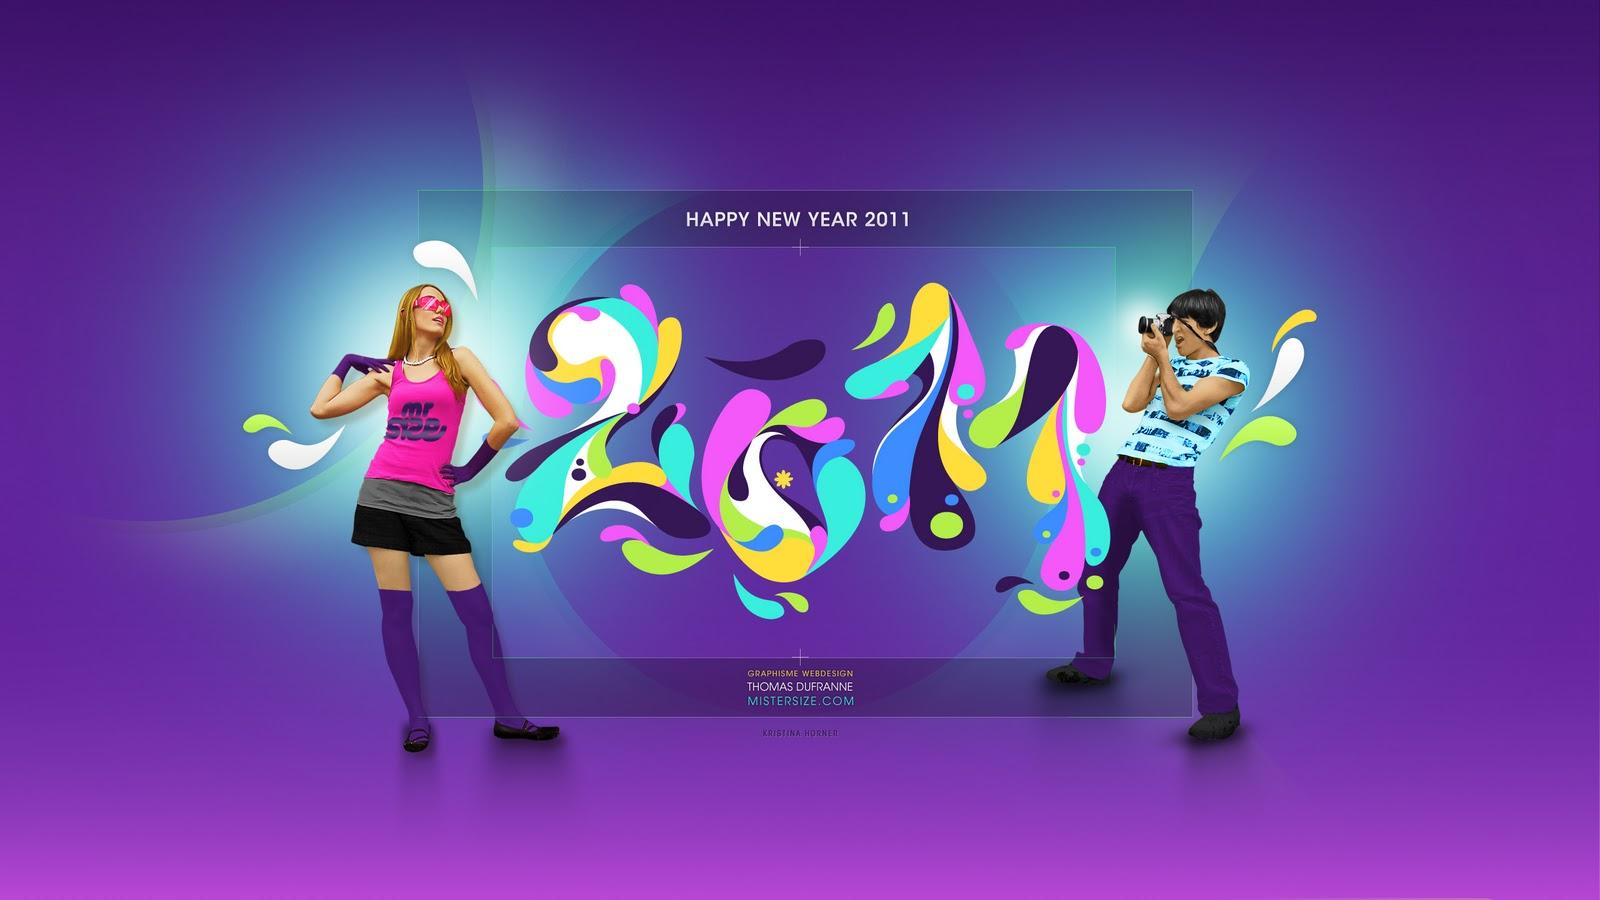 http://4.bp.blogspot.com/_uPUaN_isAEk/TR3PfI83TII/AAAAAAAAAFM/hkmF12X6G4o/s1600/wallpaper-2011-imac-27.jpg